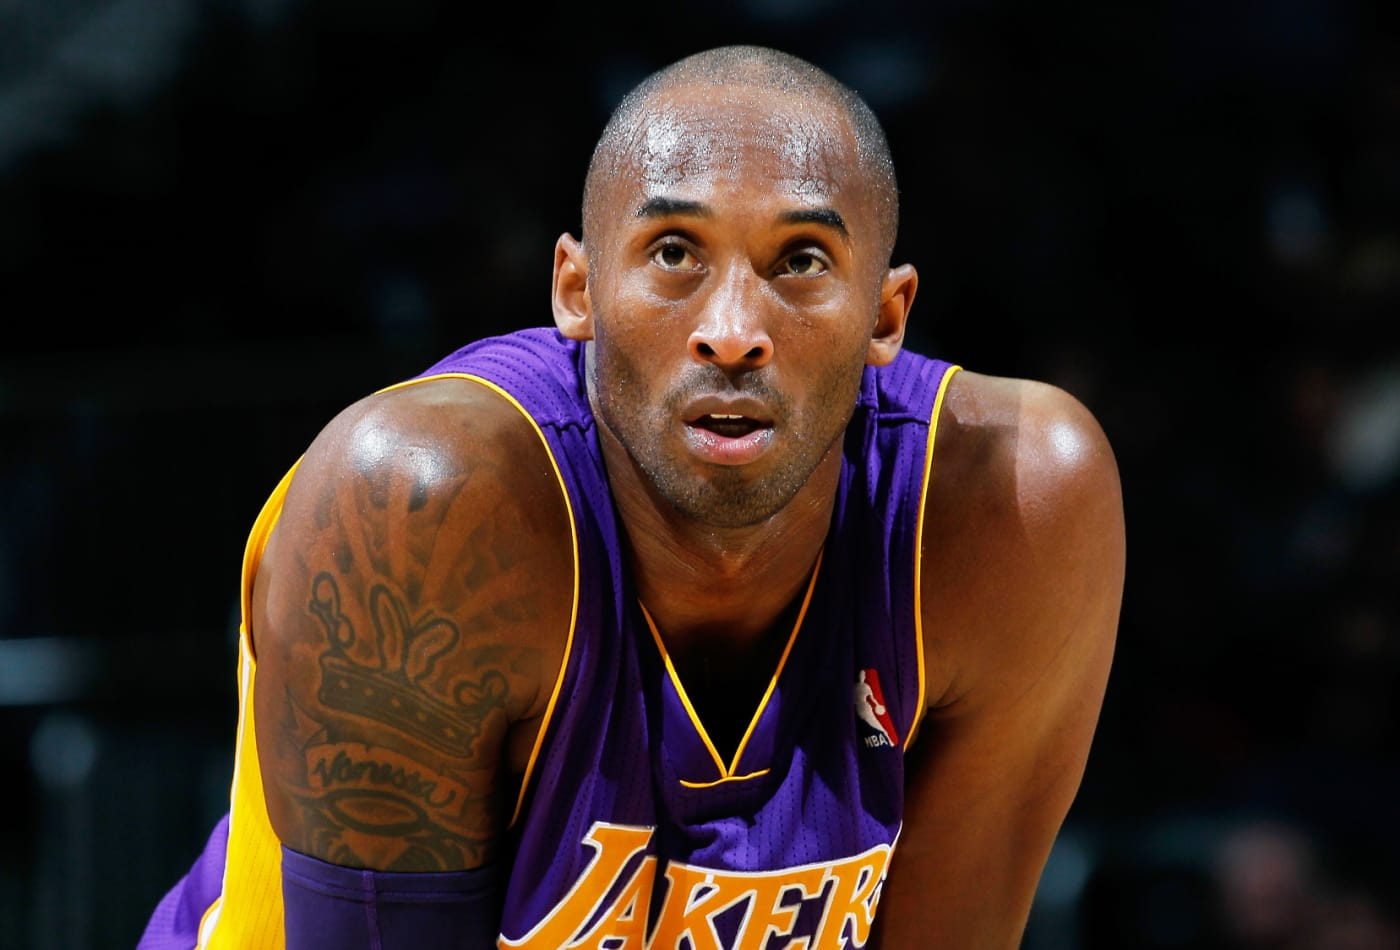 PICS: NBA Legend Kobe Bryant Dead At 41 Years Old